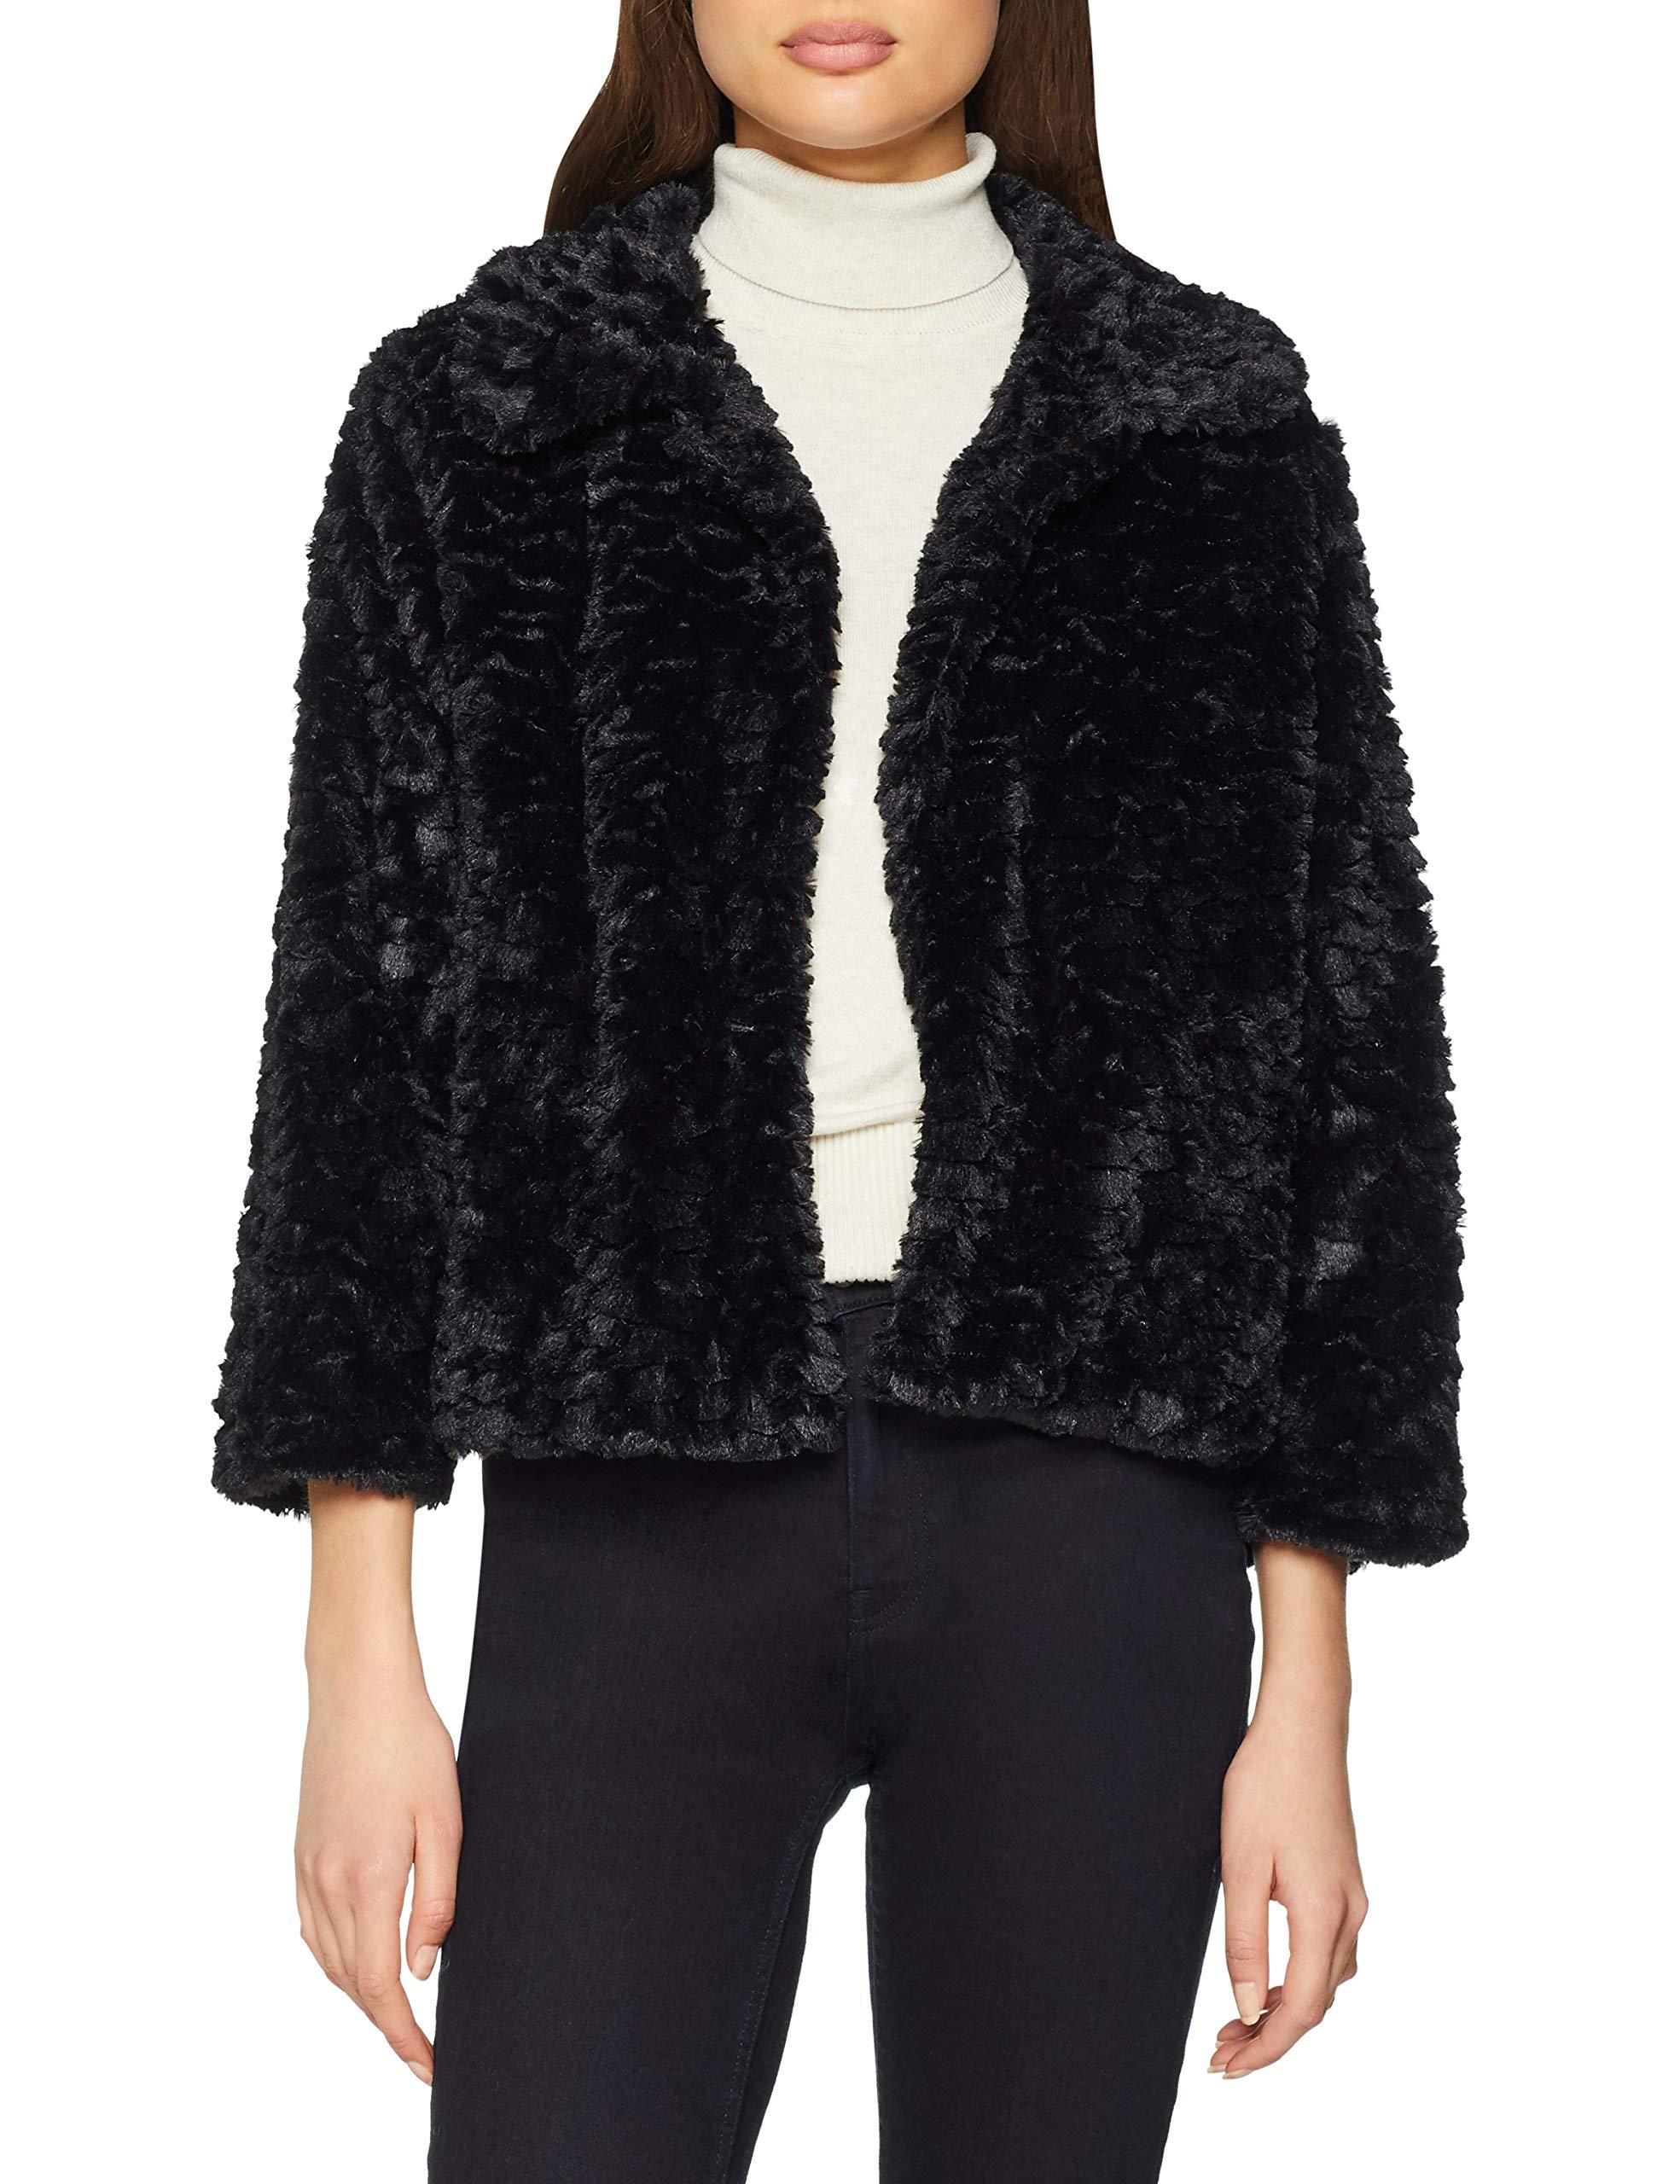 Collar FabricantMediumFemme Faux BlousonNoirblack40taille Jacket Mela Fur QxCrthsd